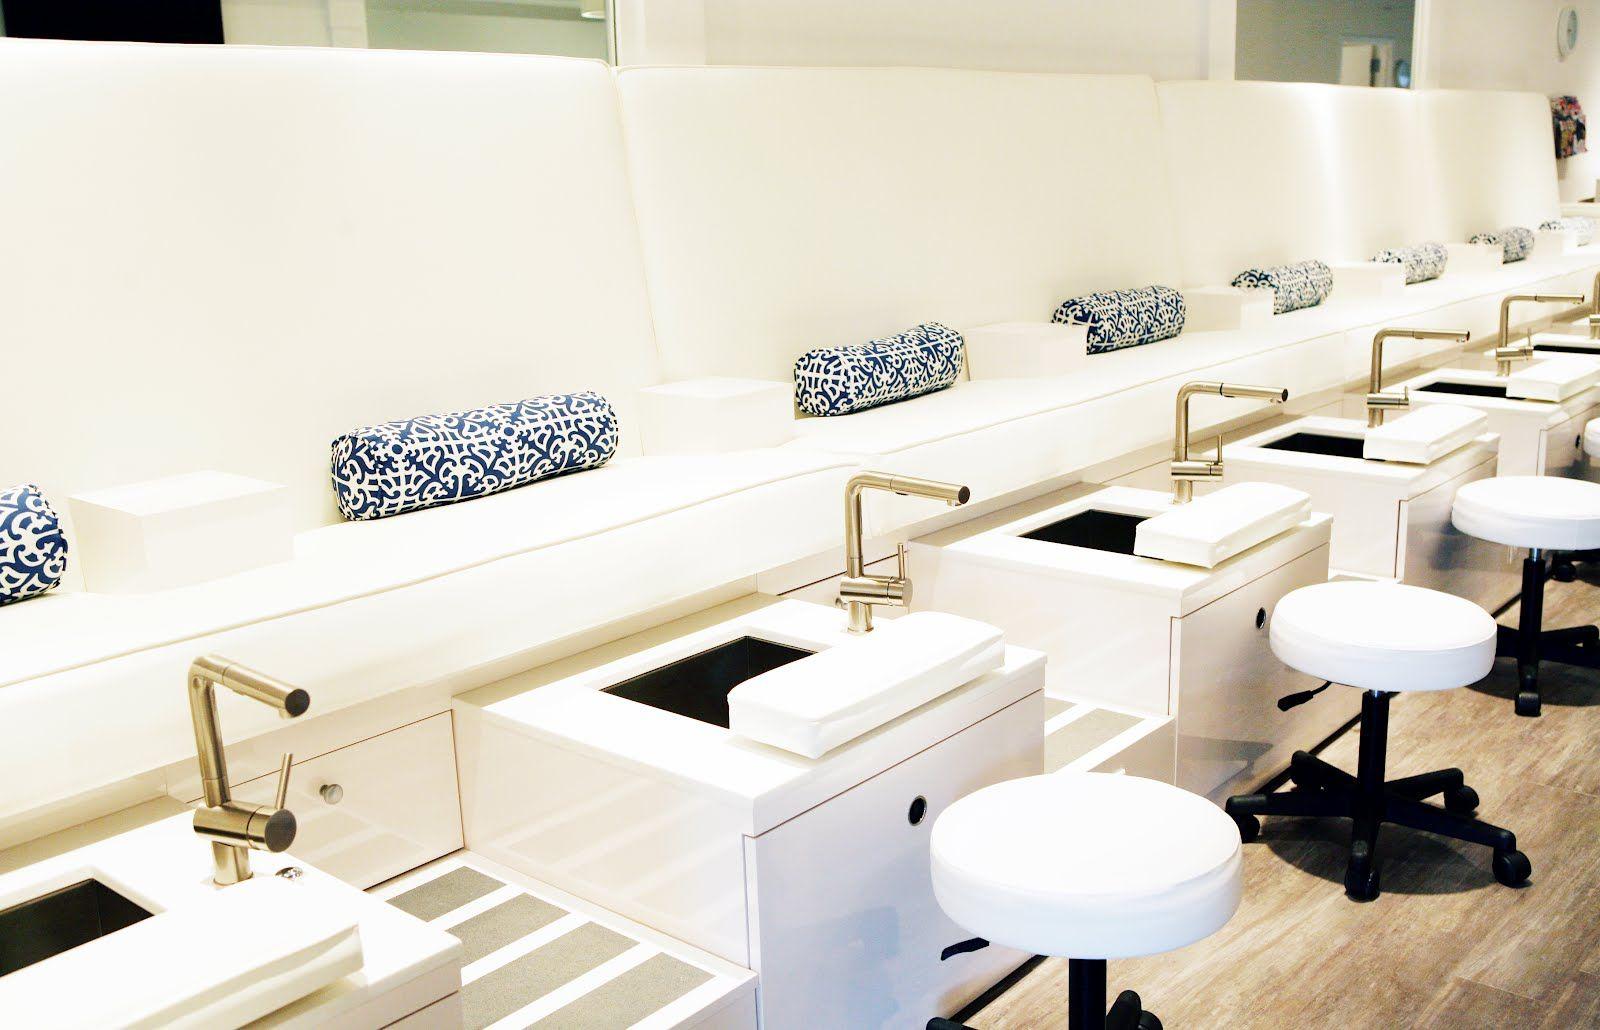 Usa Gallery Of Salon Spa Design Station Pedicure Salon Esthetique Decor Du Salon D Ongle